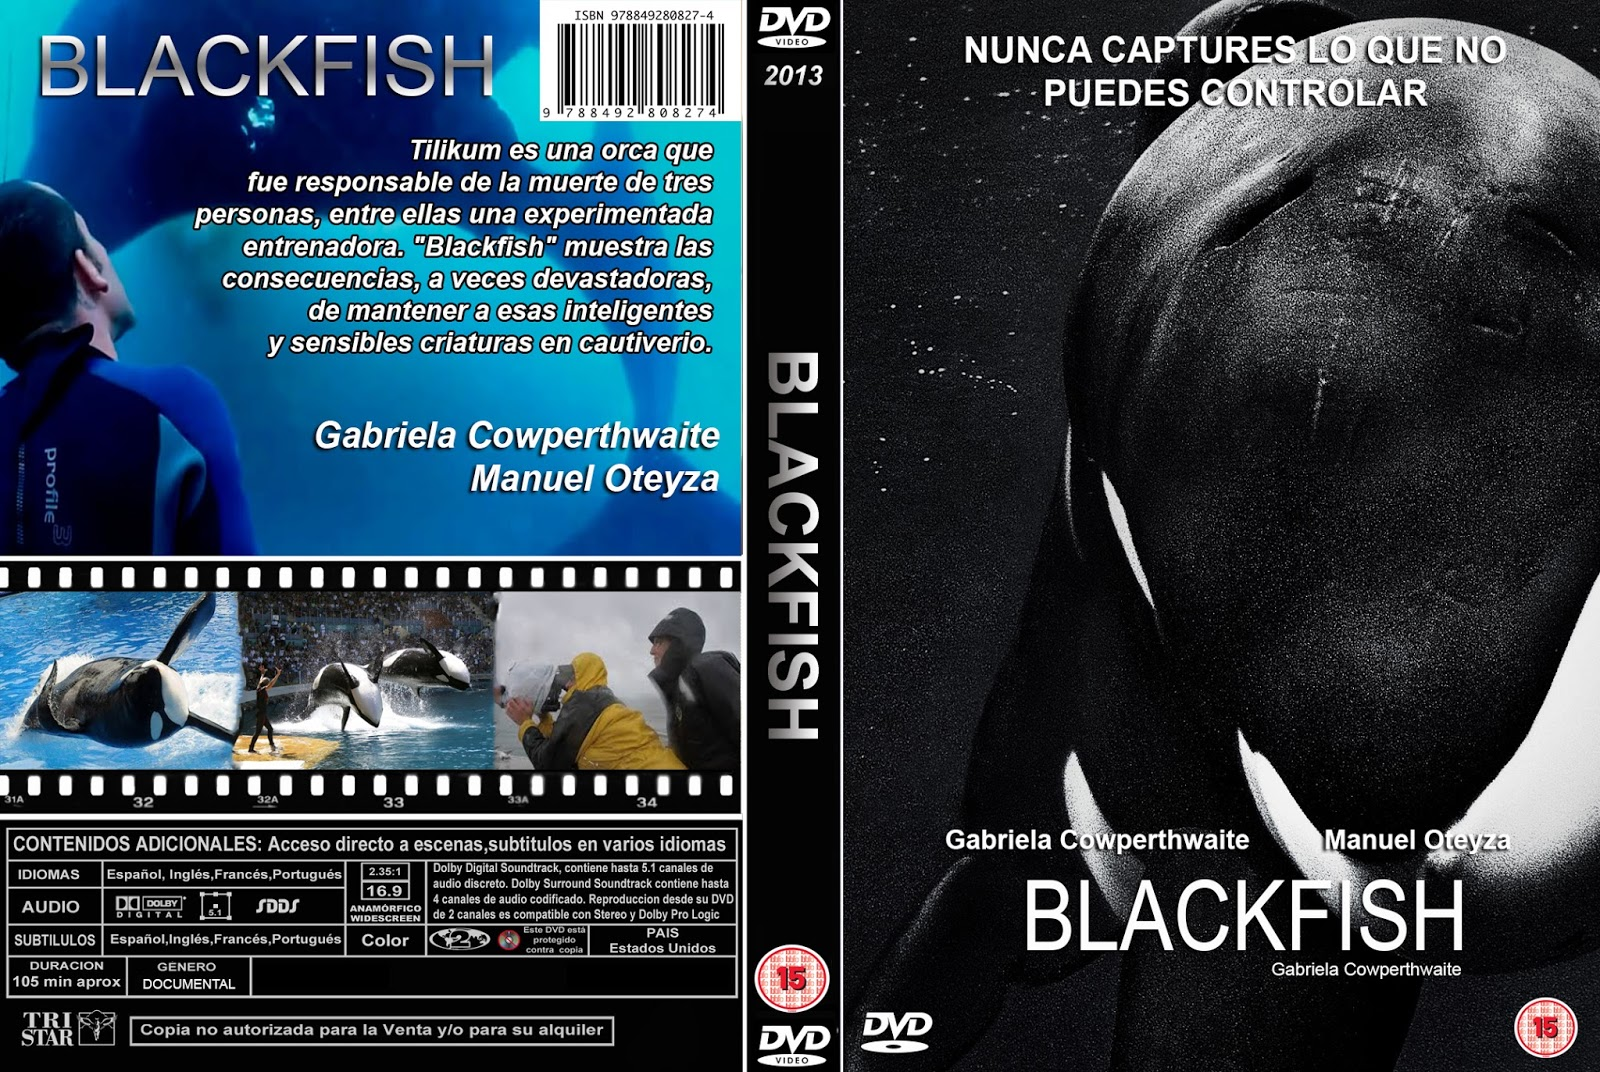 PB | DVD Cover / Caratula FREE: BLACKFISH - DVD COVER 2013 ... - photo#7